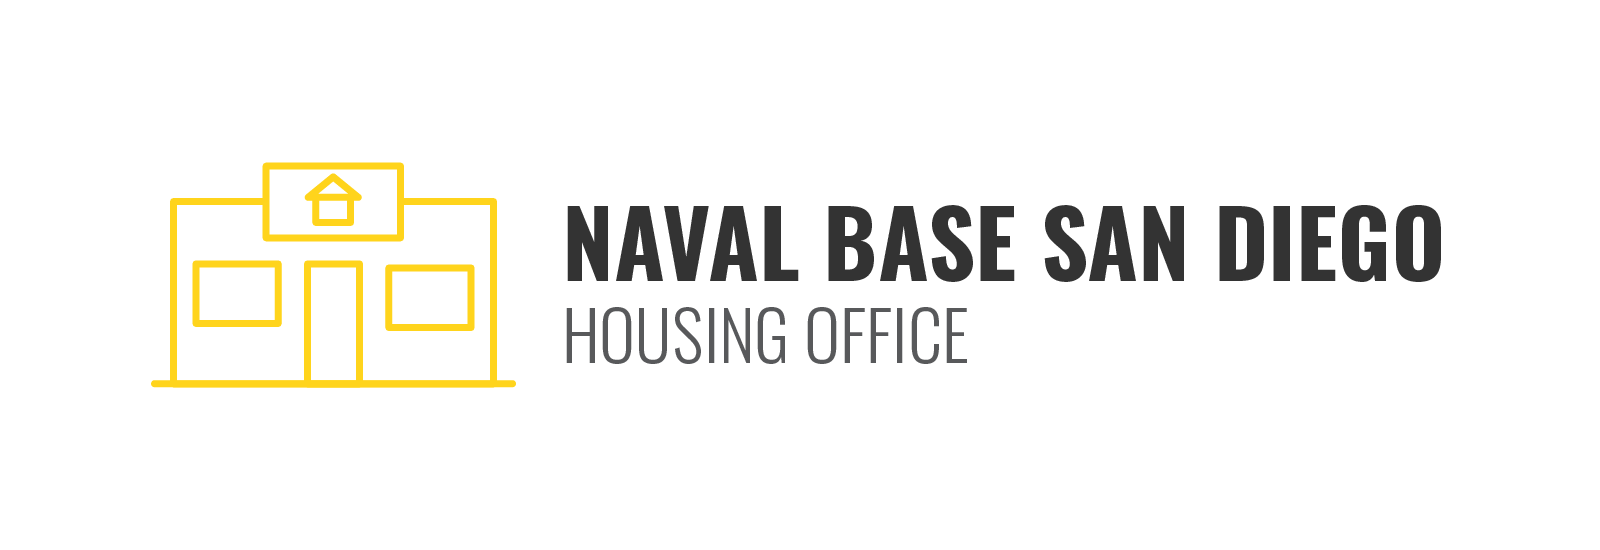 Naval Base San Diego Housing Office